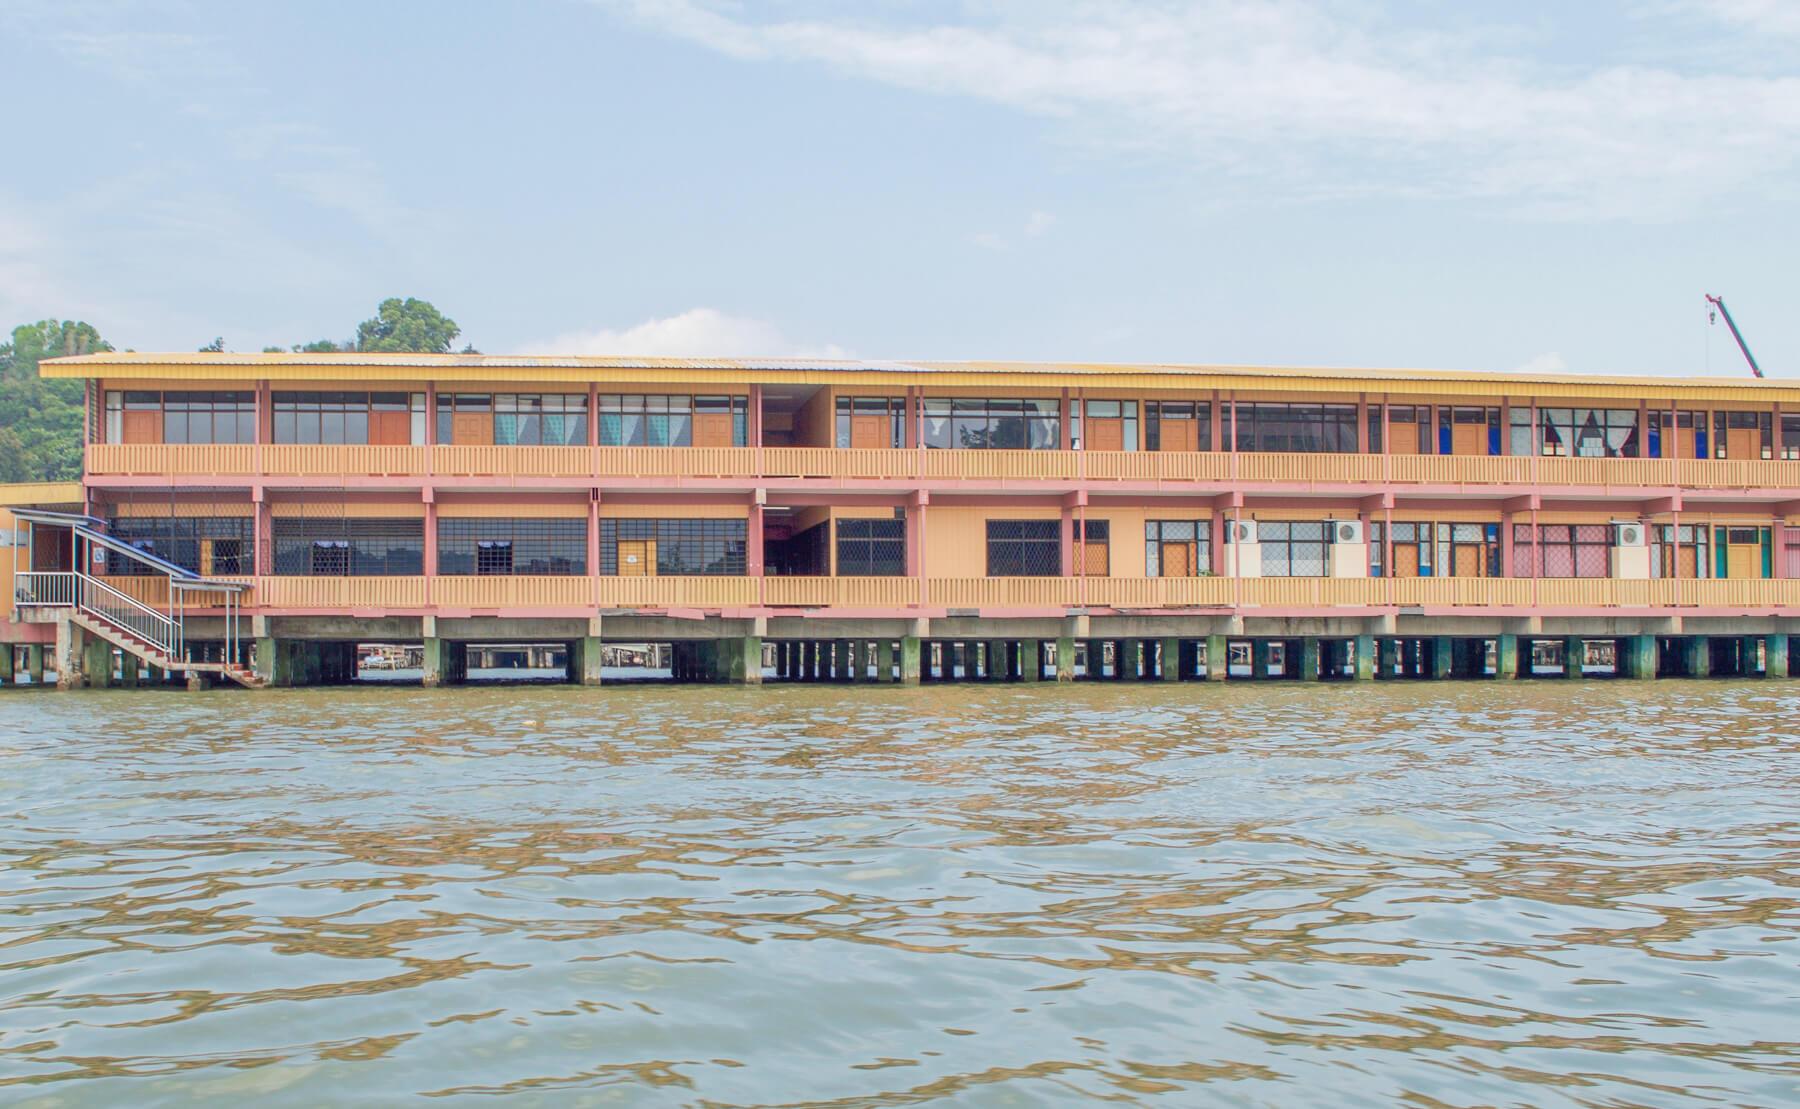 An orange building over the water - Brunei Water Village School